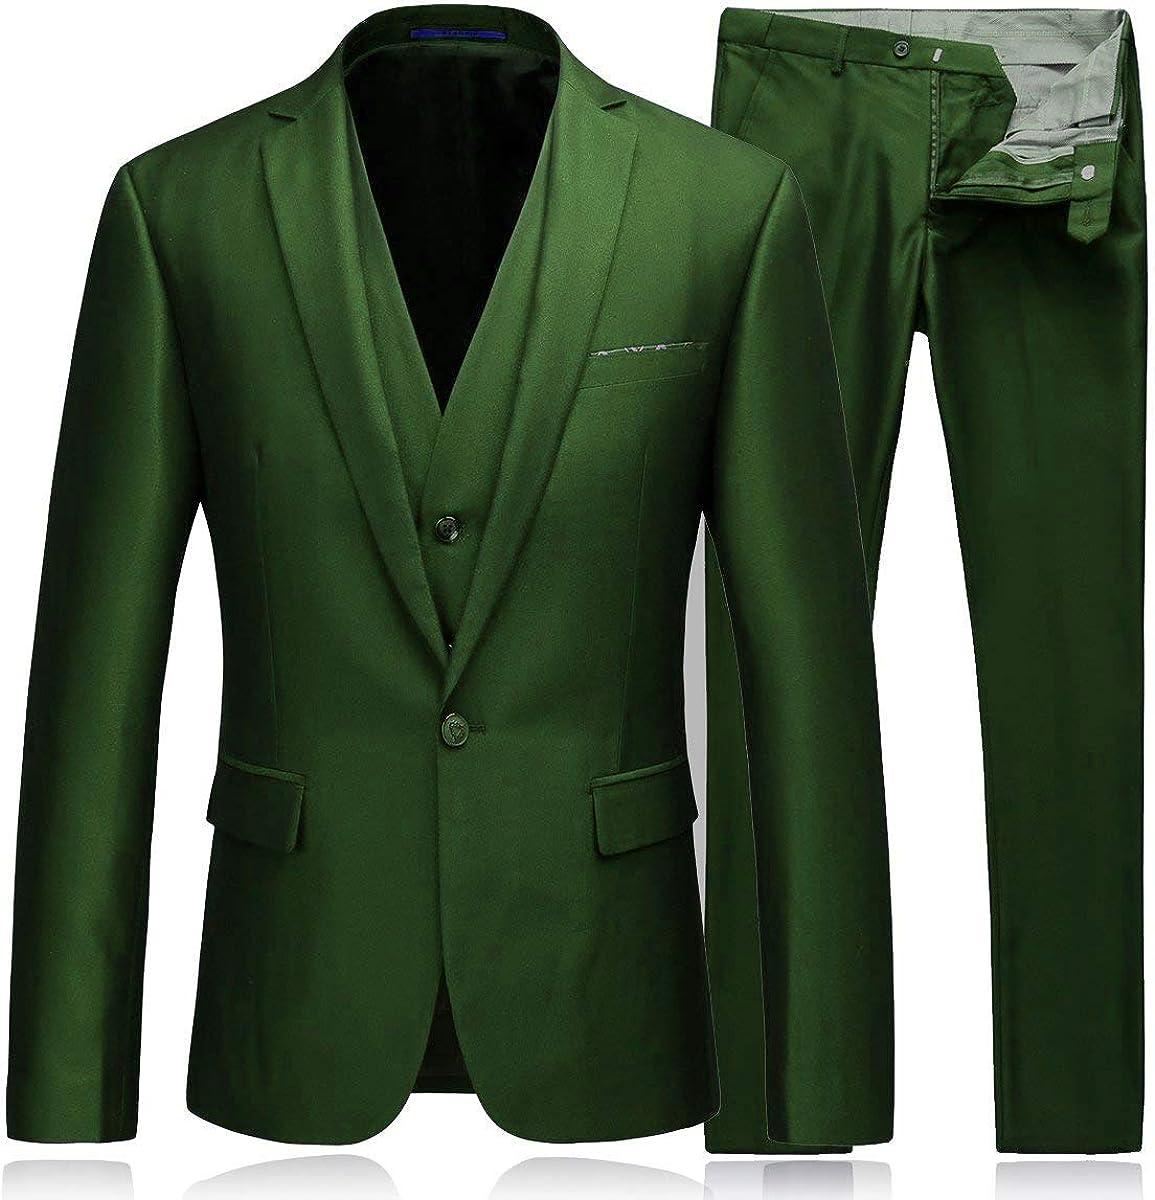 JinXuanYa Men/'s Suit One Button Slim Fit 2 Piece Suit for Men Casual//Formal//Wedding Party//Tuxedo